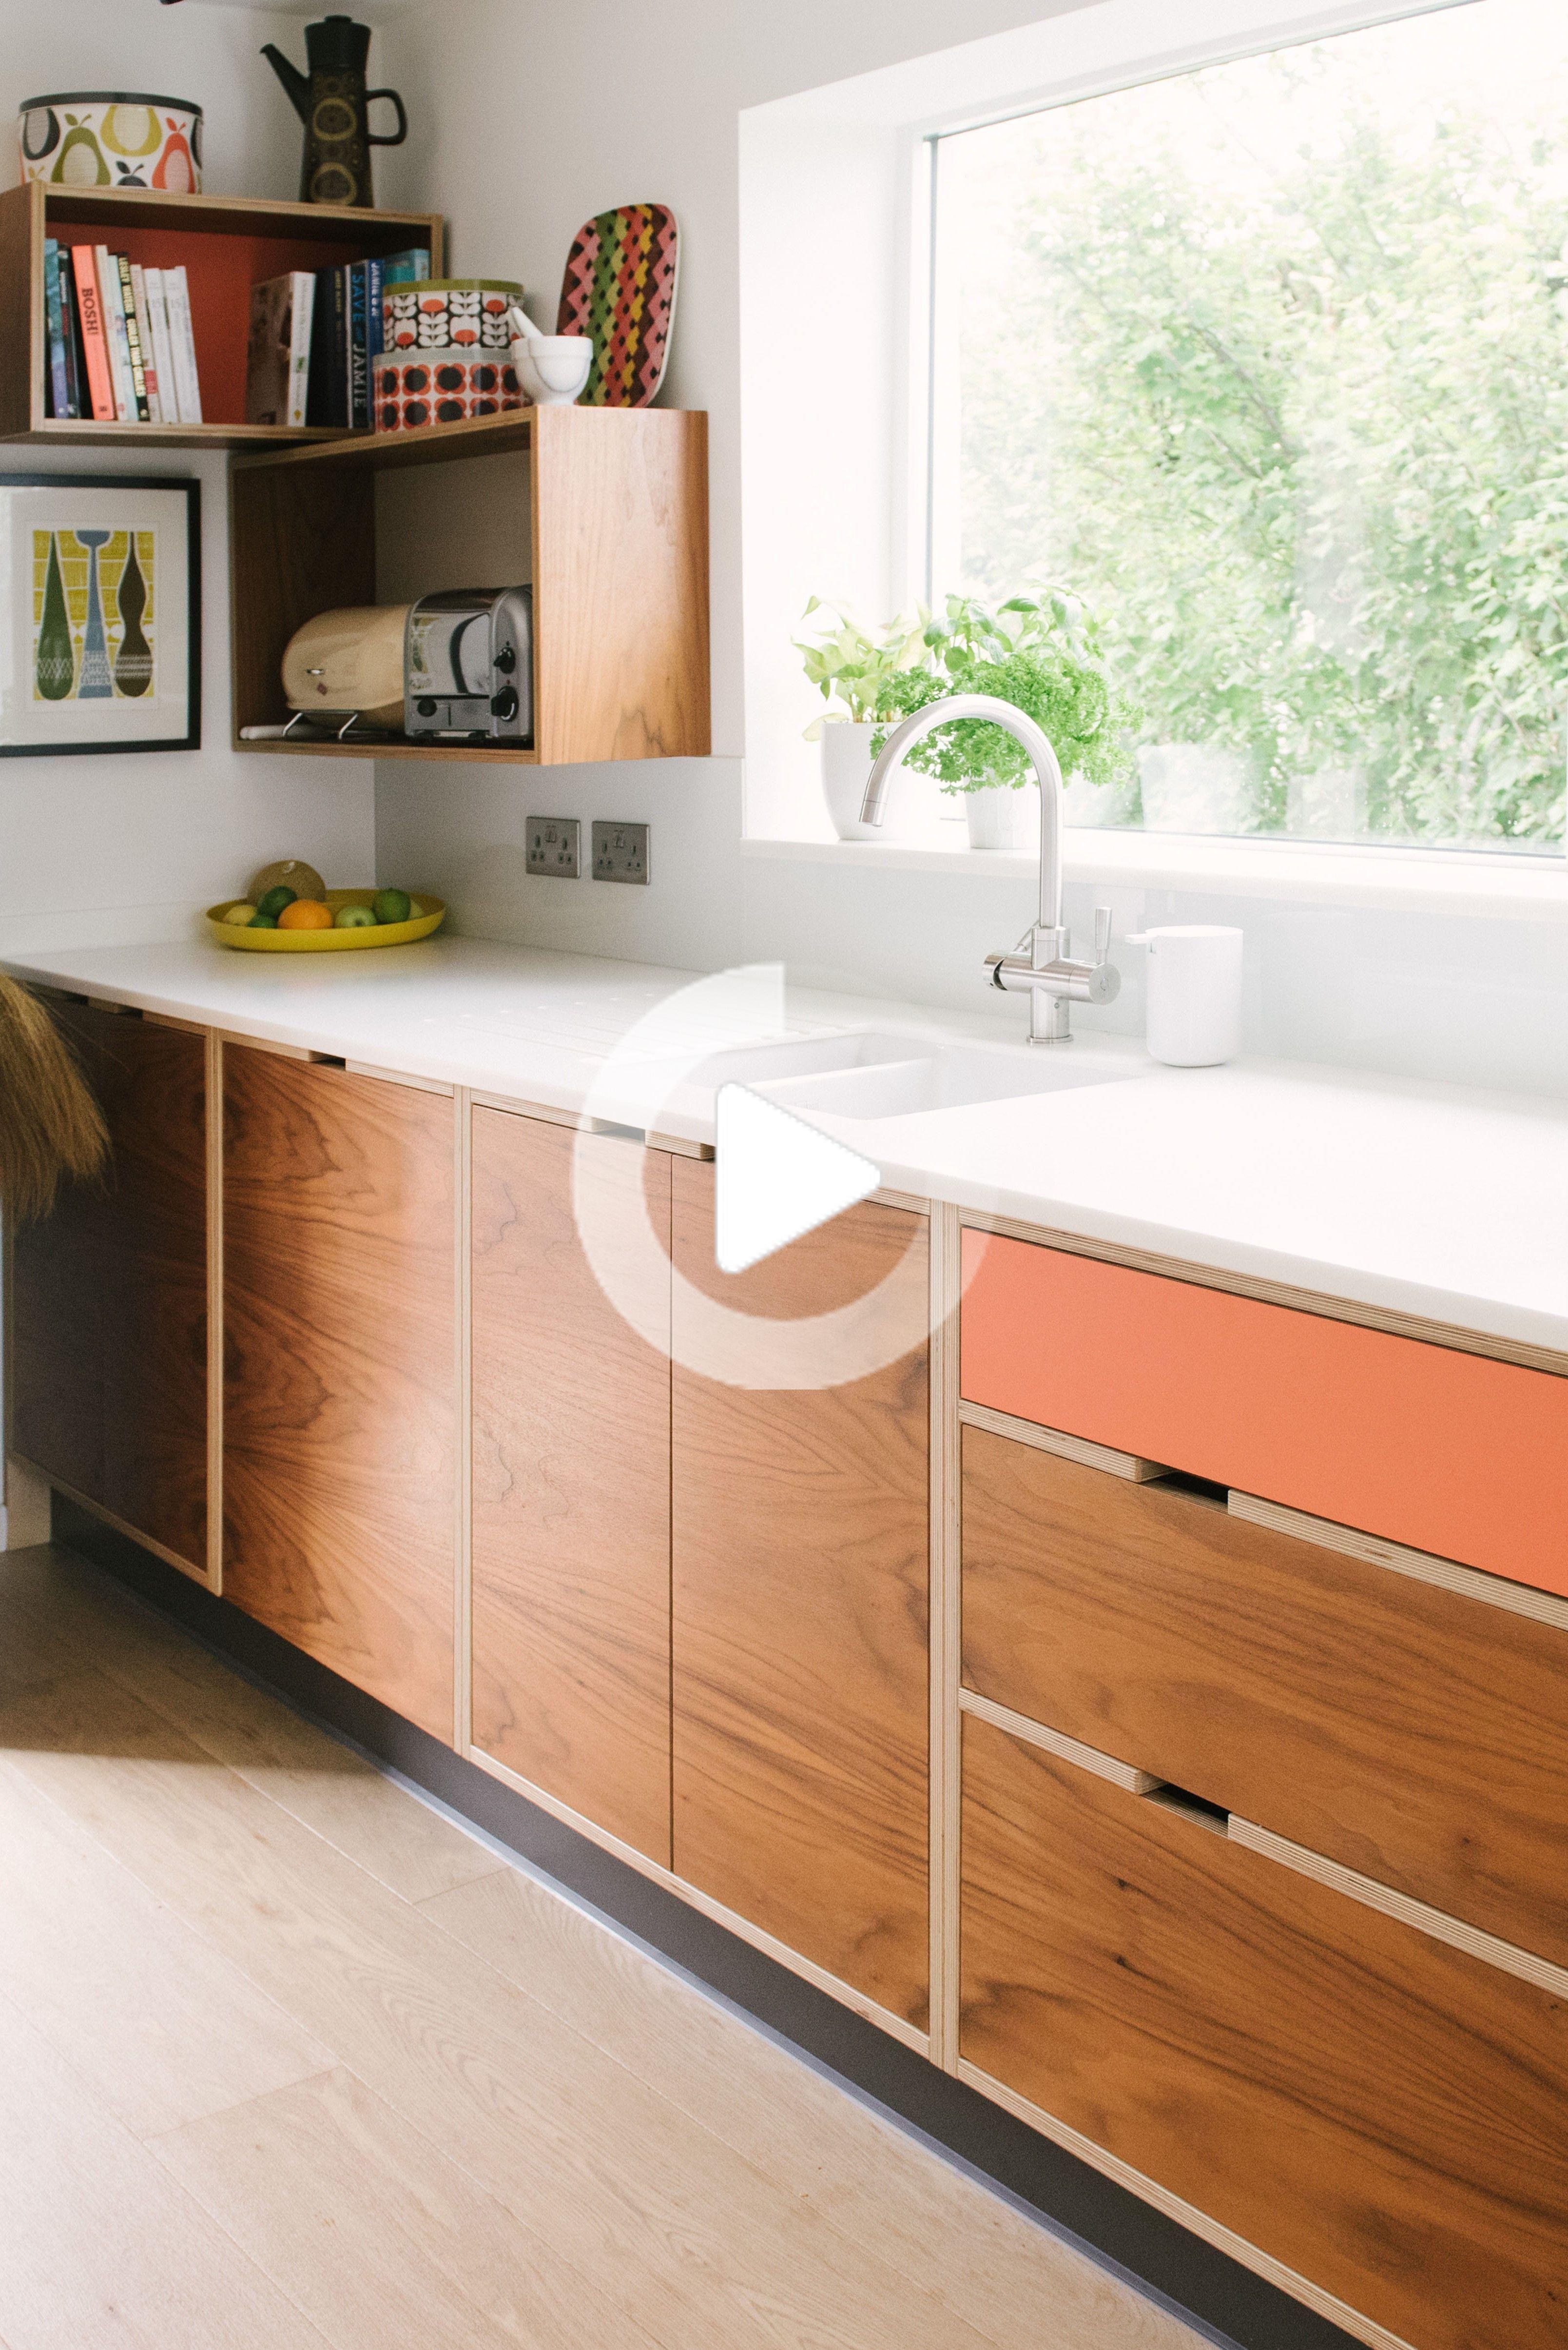 Mid Century Style Kitchen   Wood & Wire  Bespoke Plywood Kitchens ...